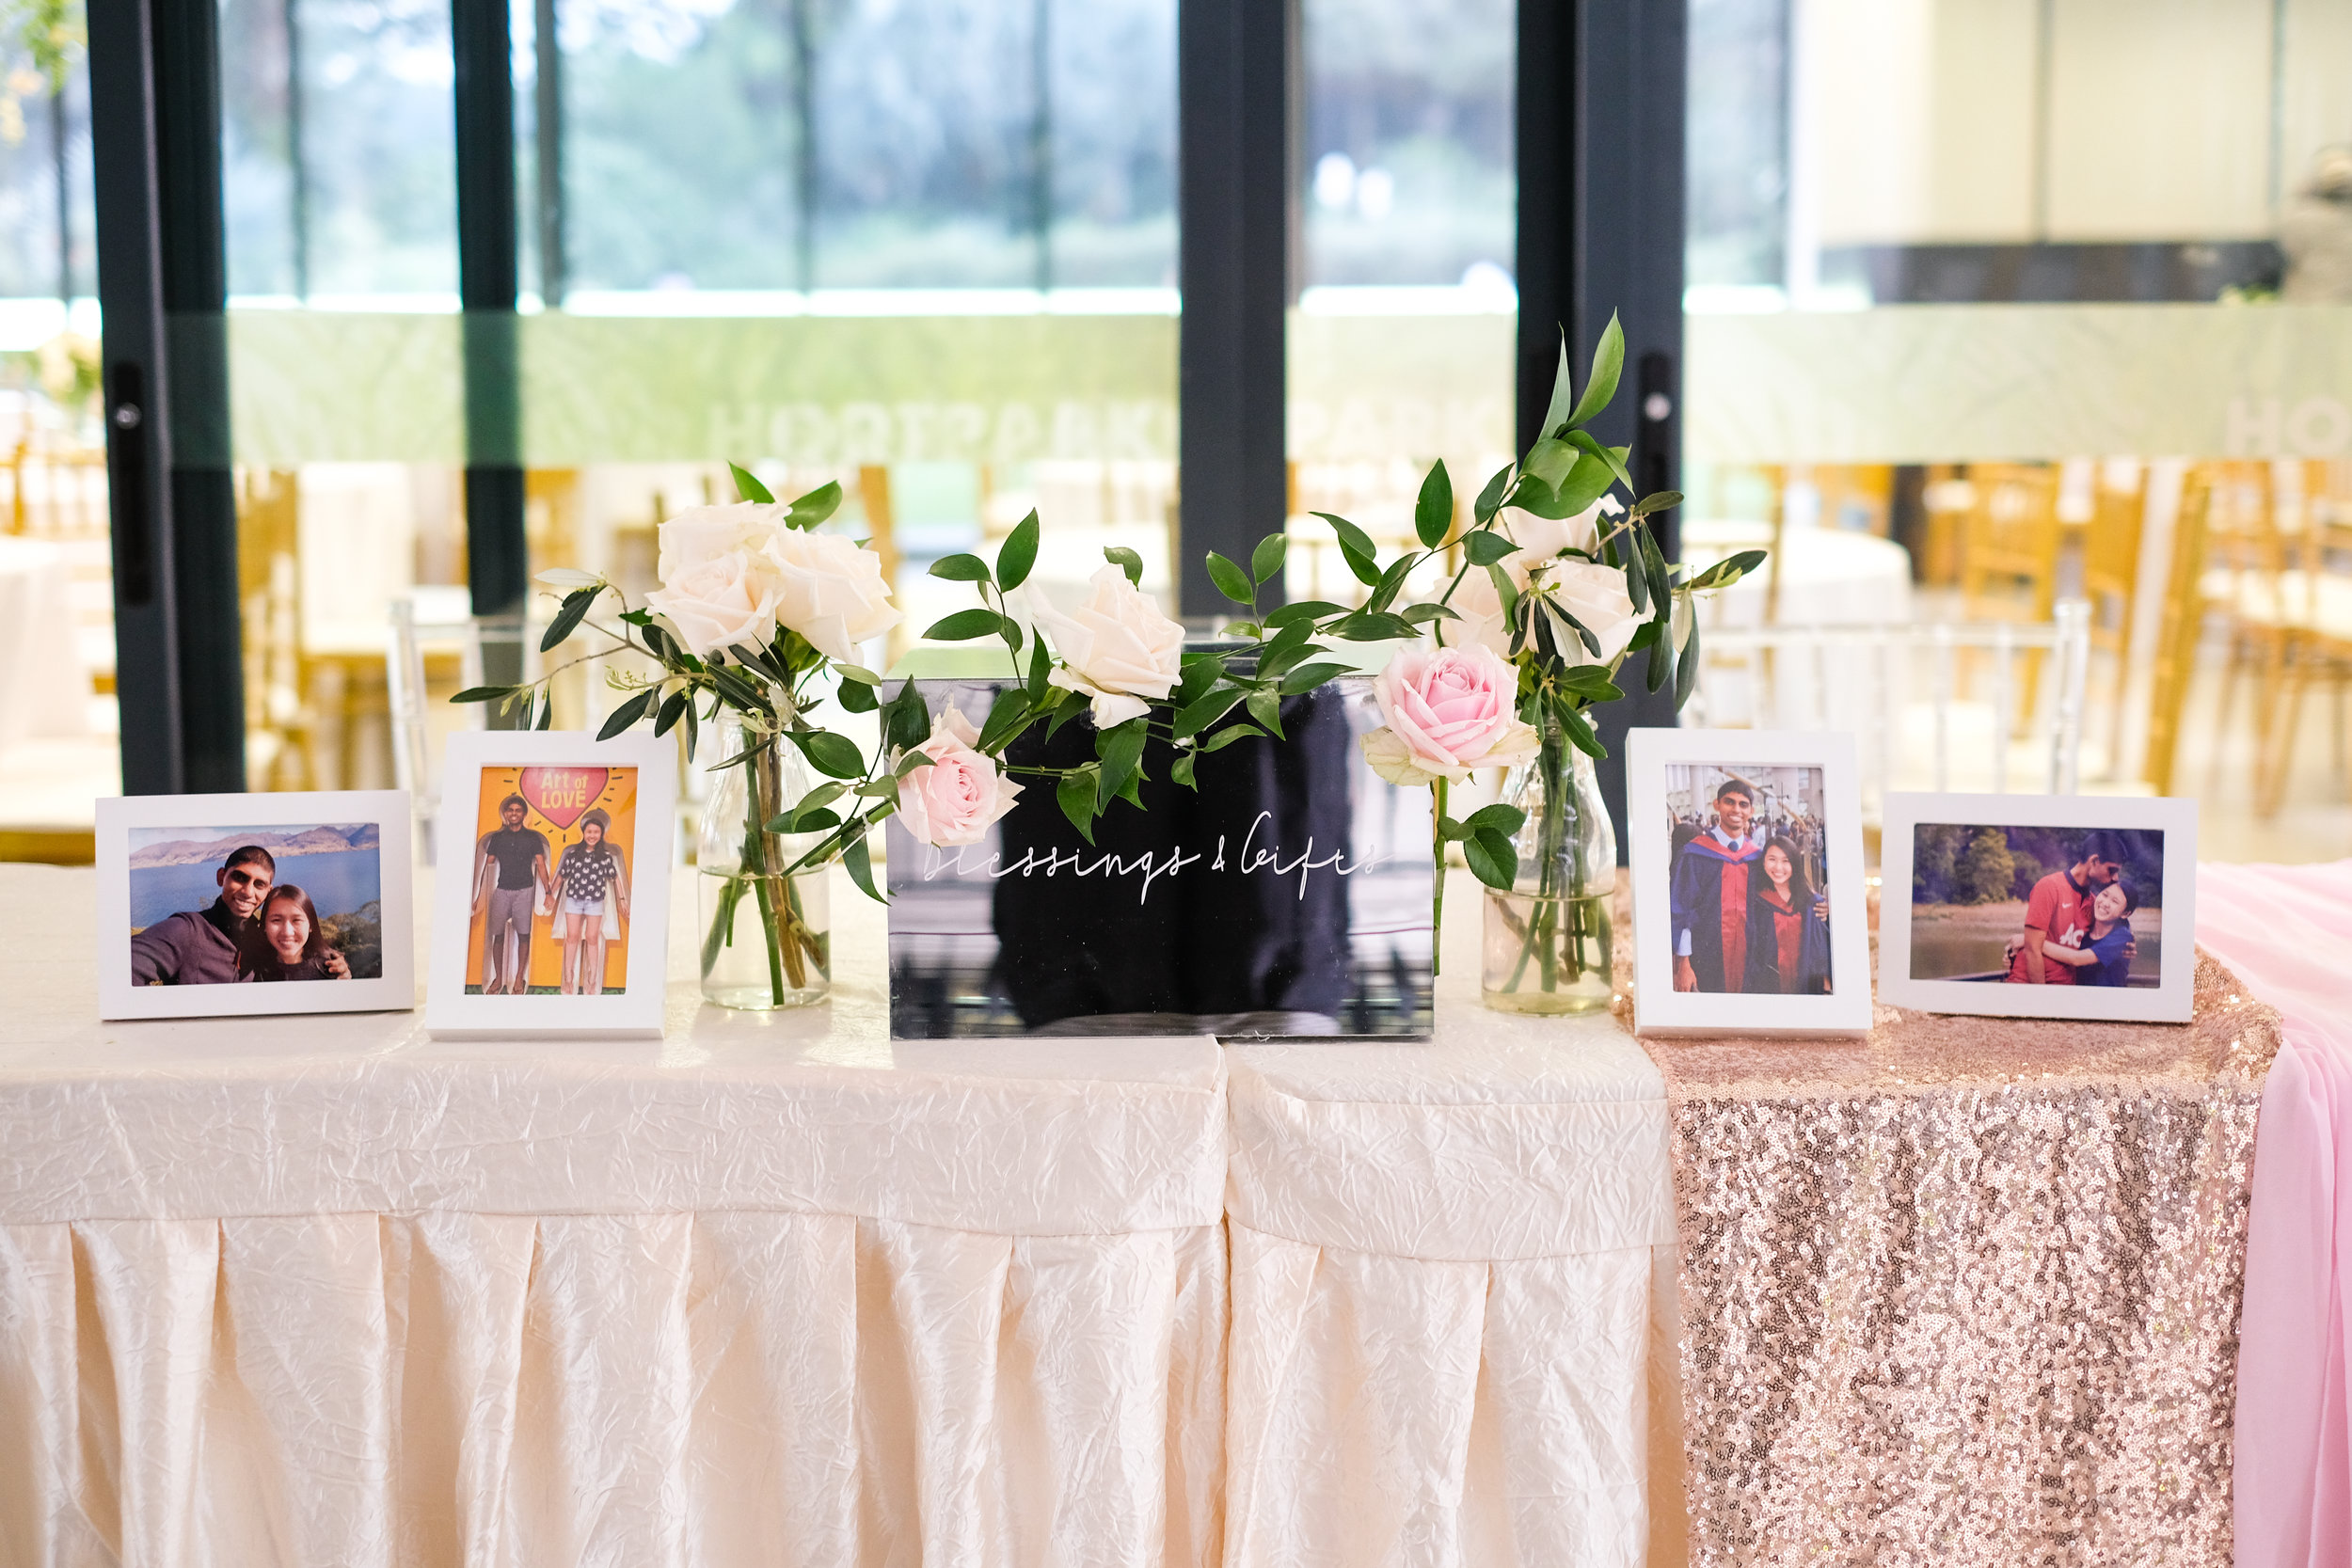 Hortpark reception table